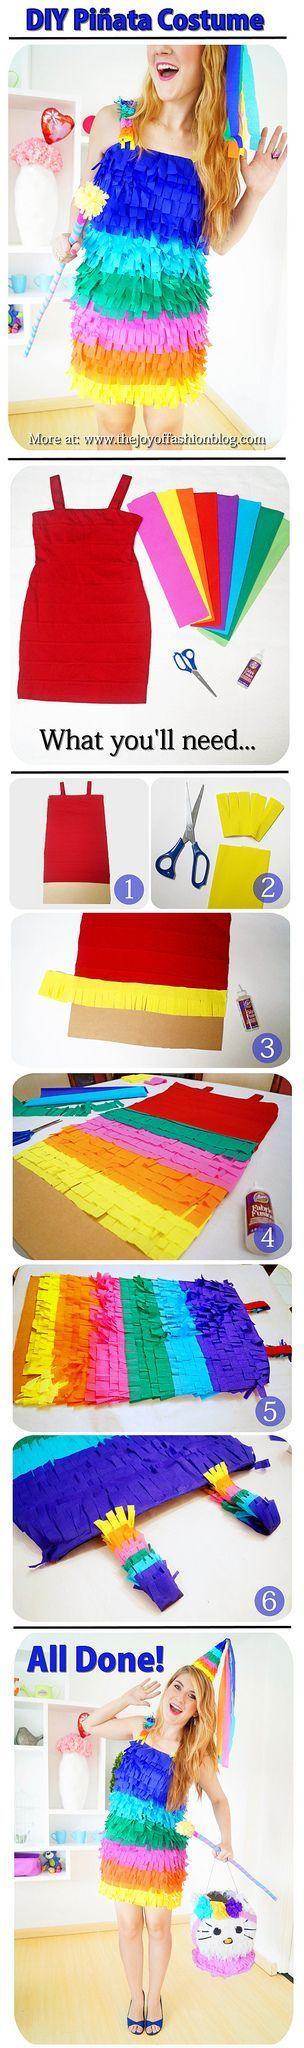 Easy Piñata Costume #halloween #costume #diy #craft                                                                                                                                                      More